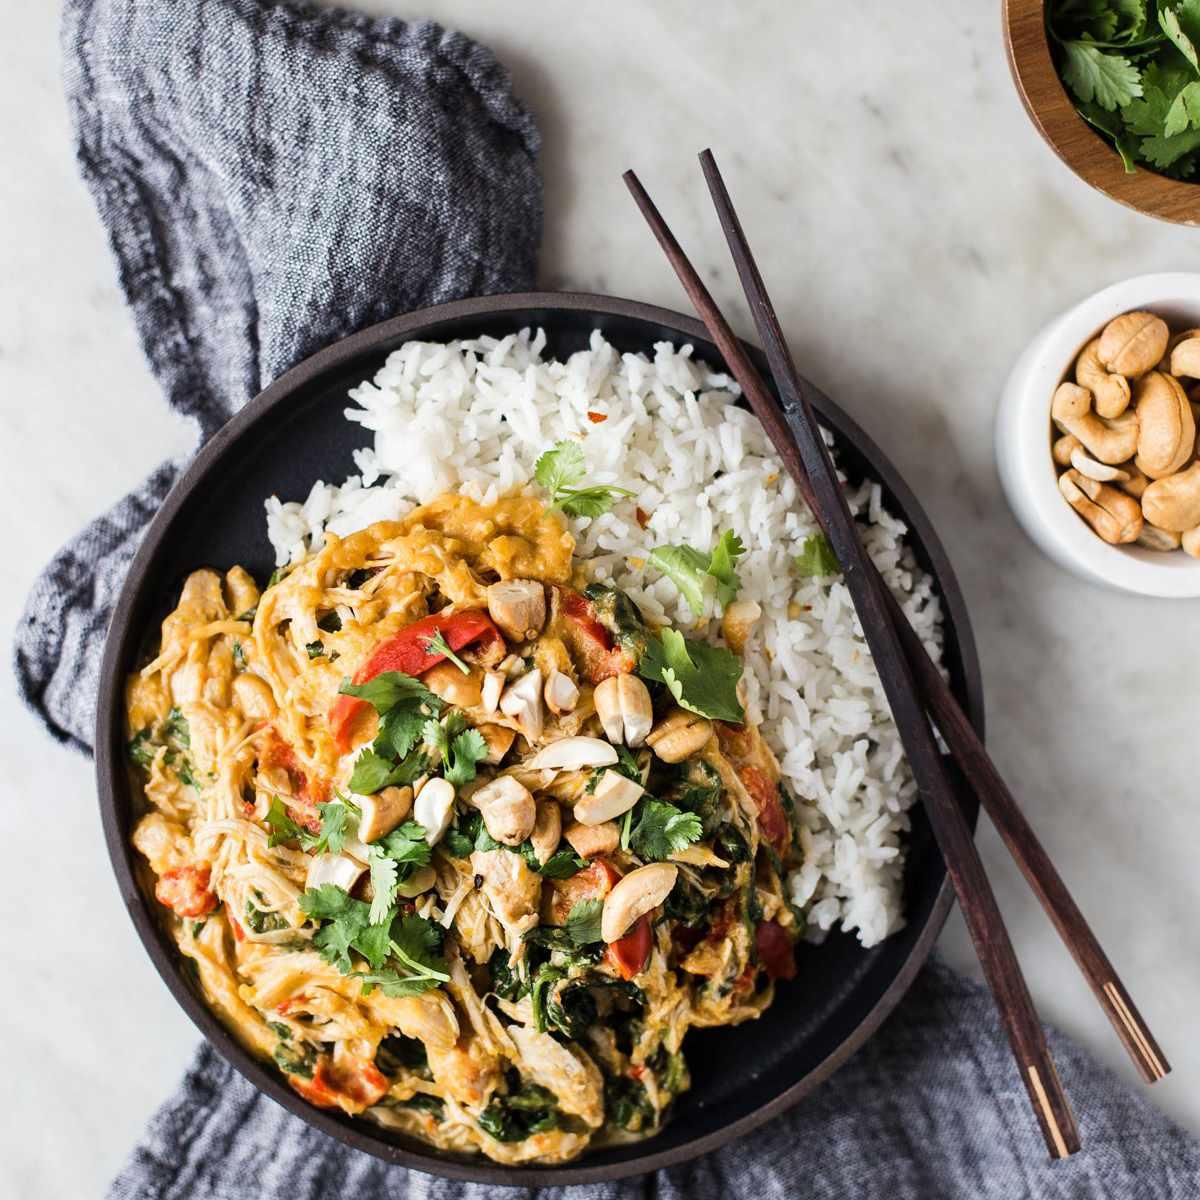 Recetas indias de olla de cocción lenta: lo moderno adecuado